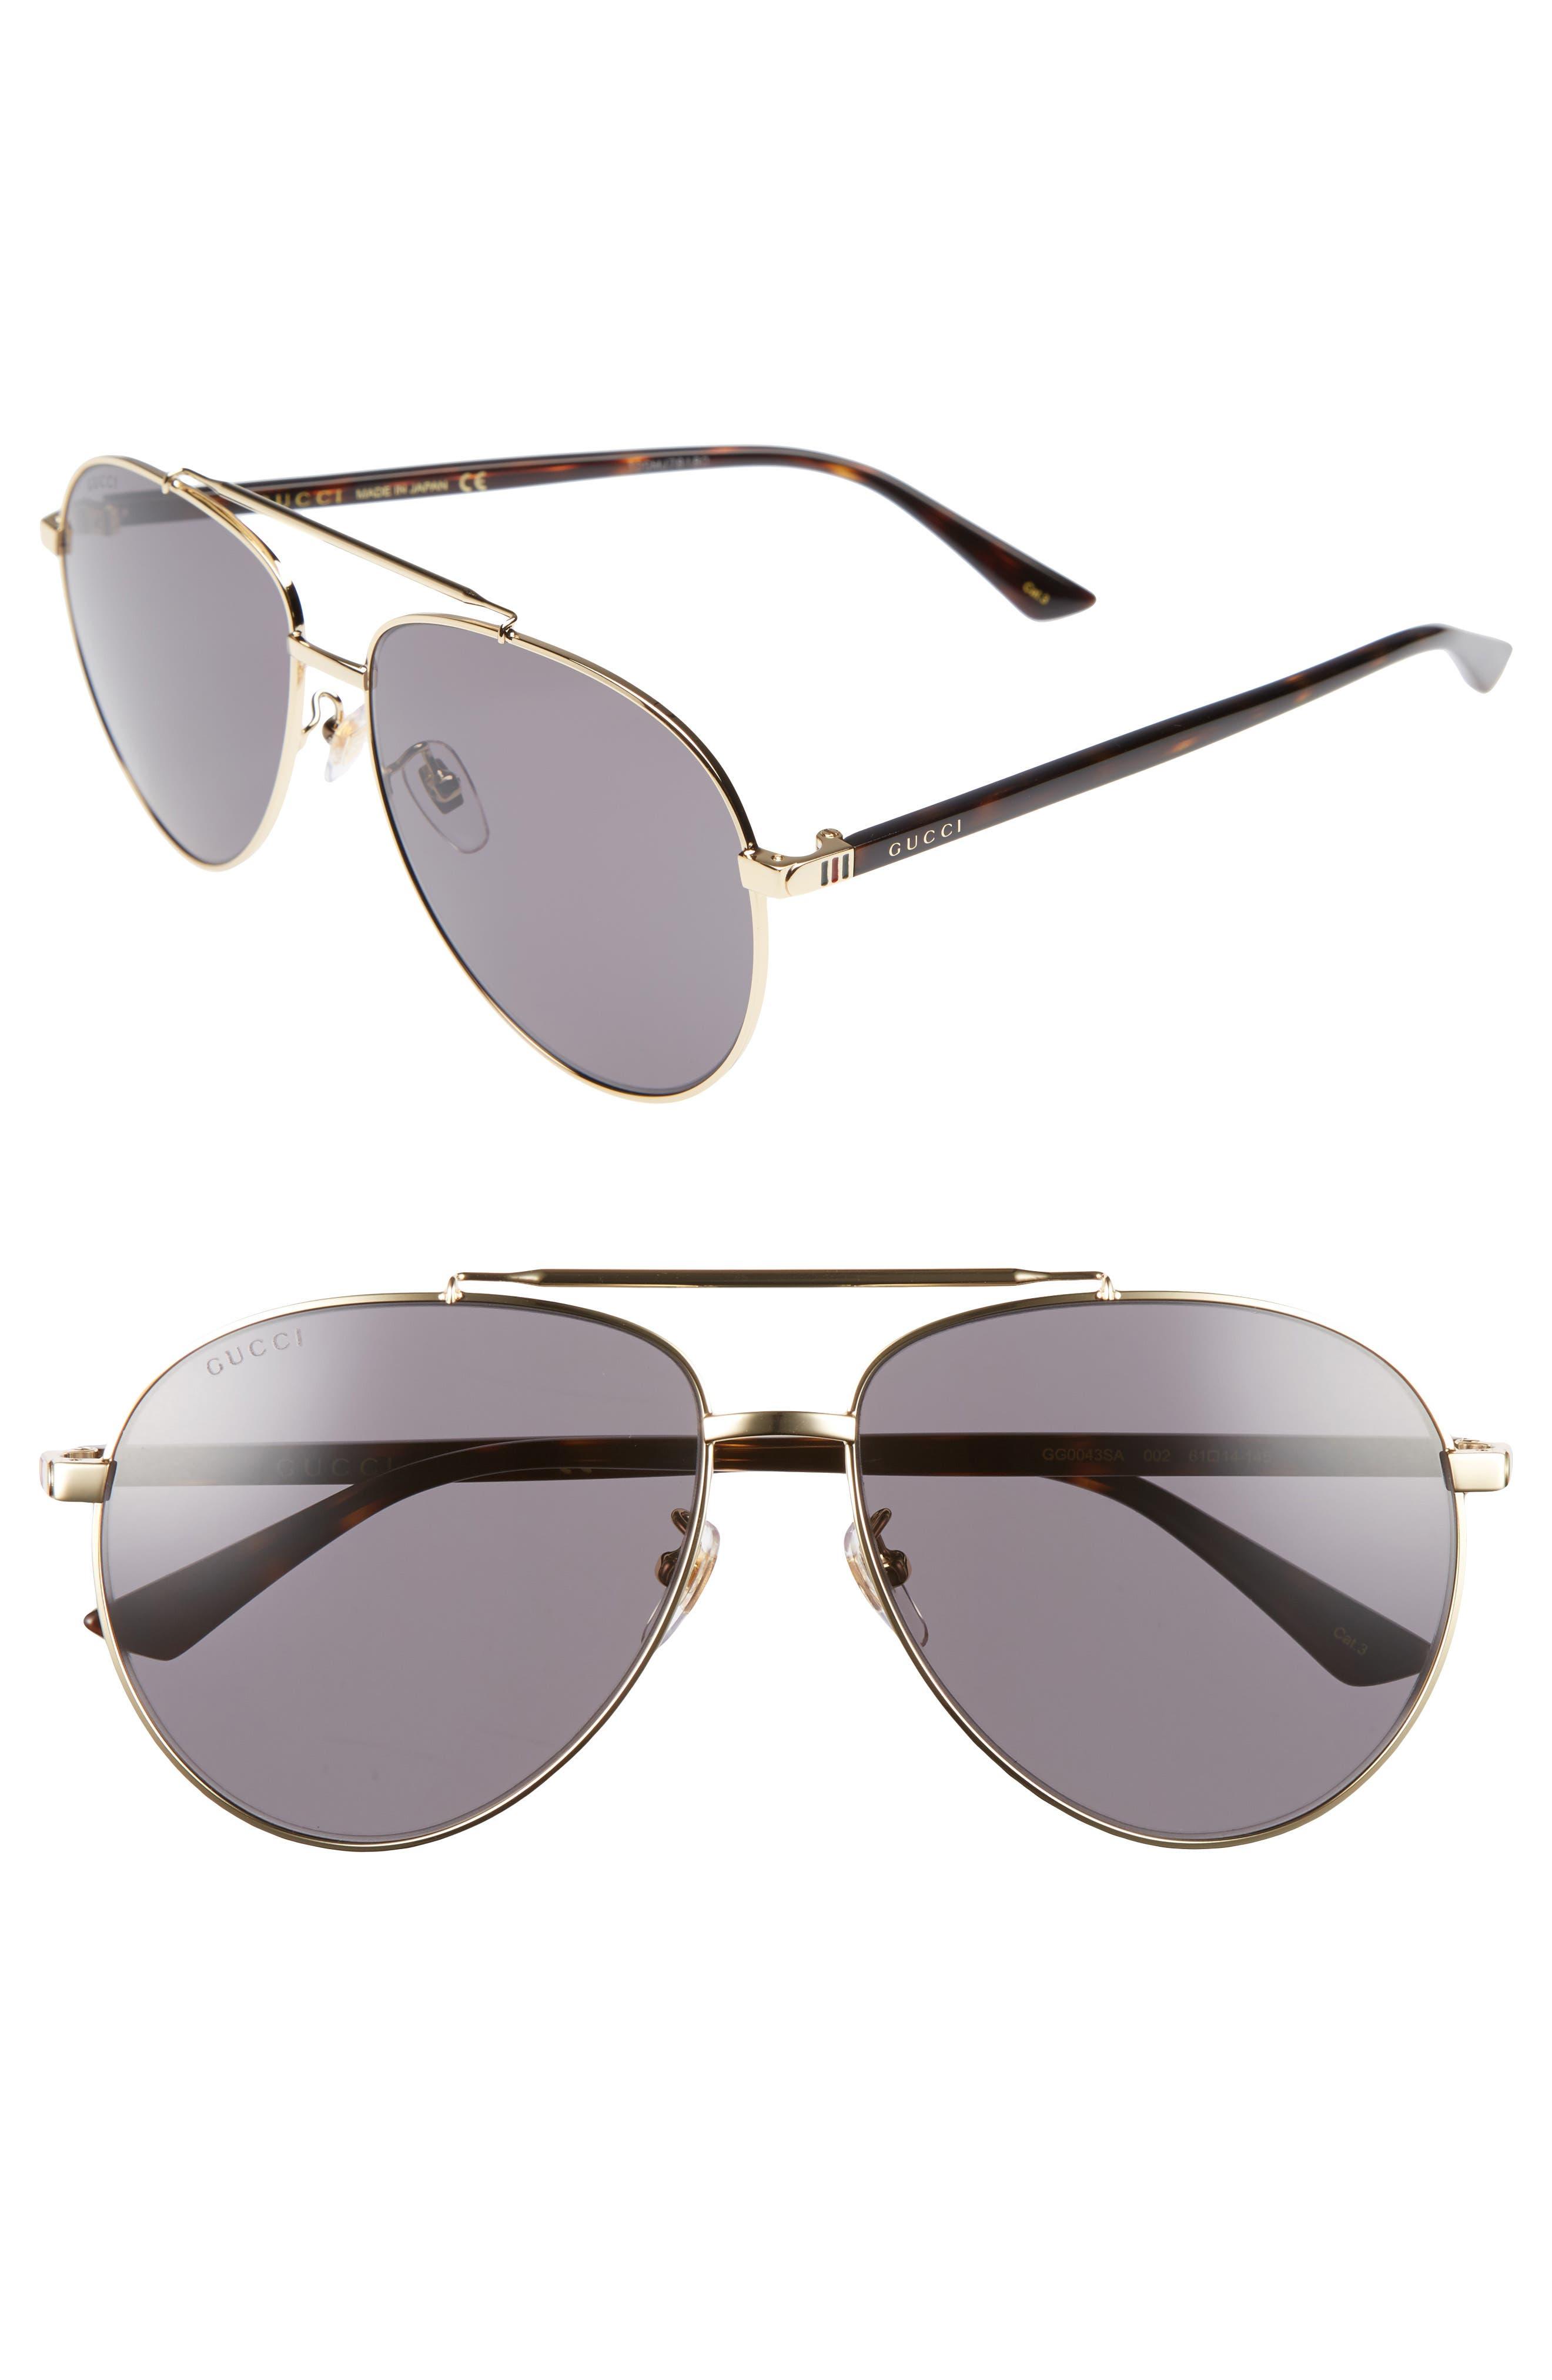 gucci 61mm aviator sunglasses. main image - gucci 61mm aviator sunglasses g